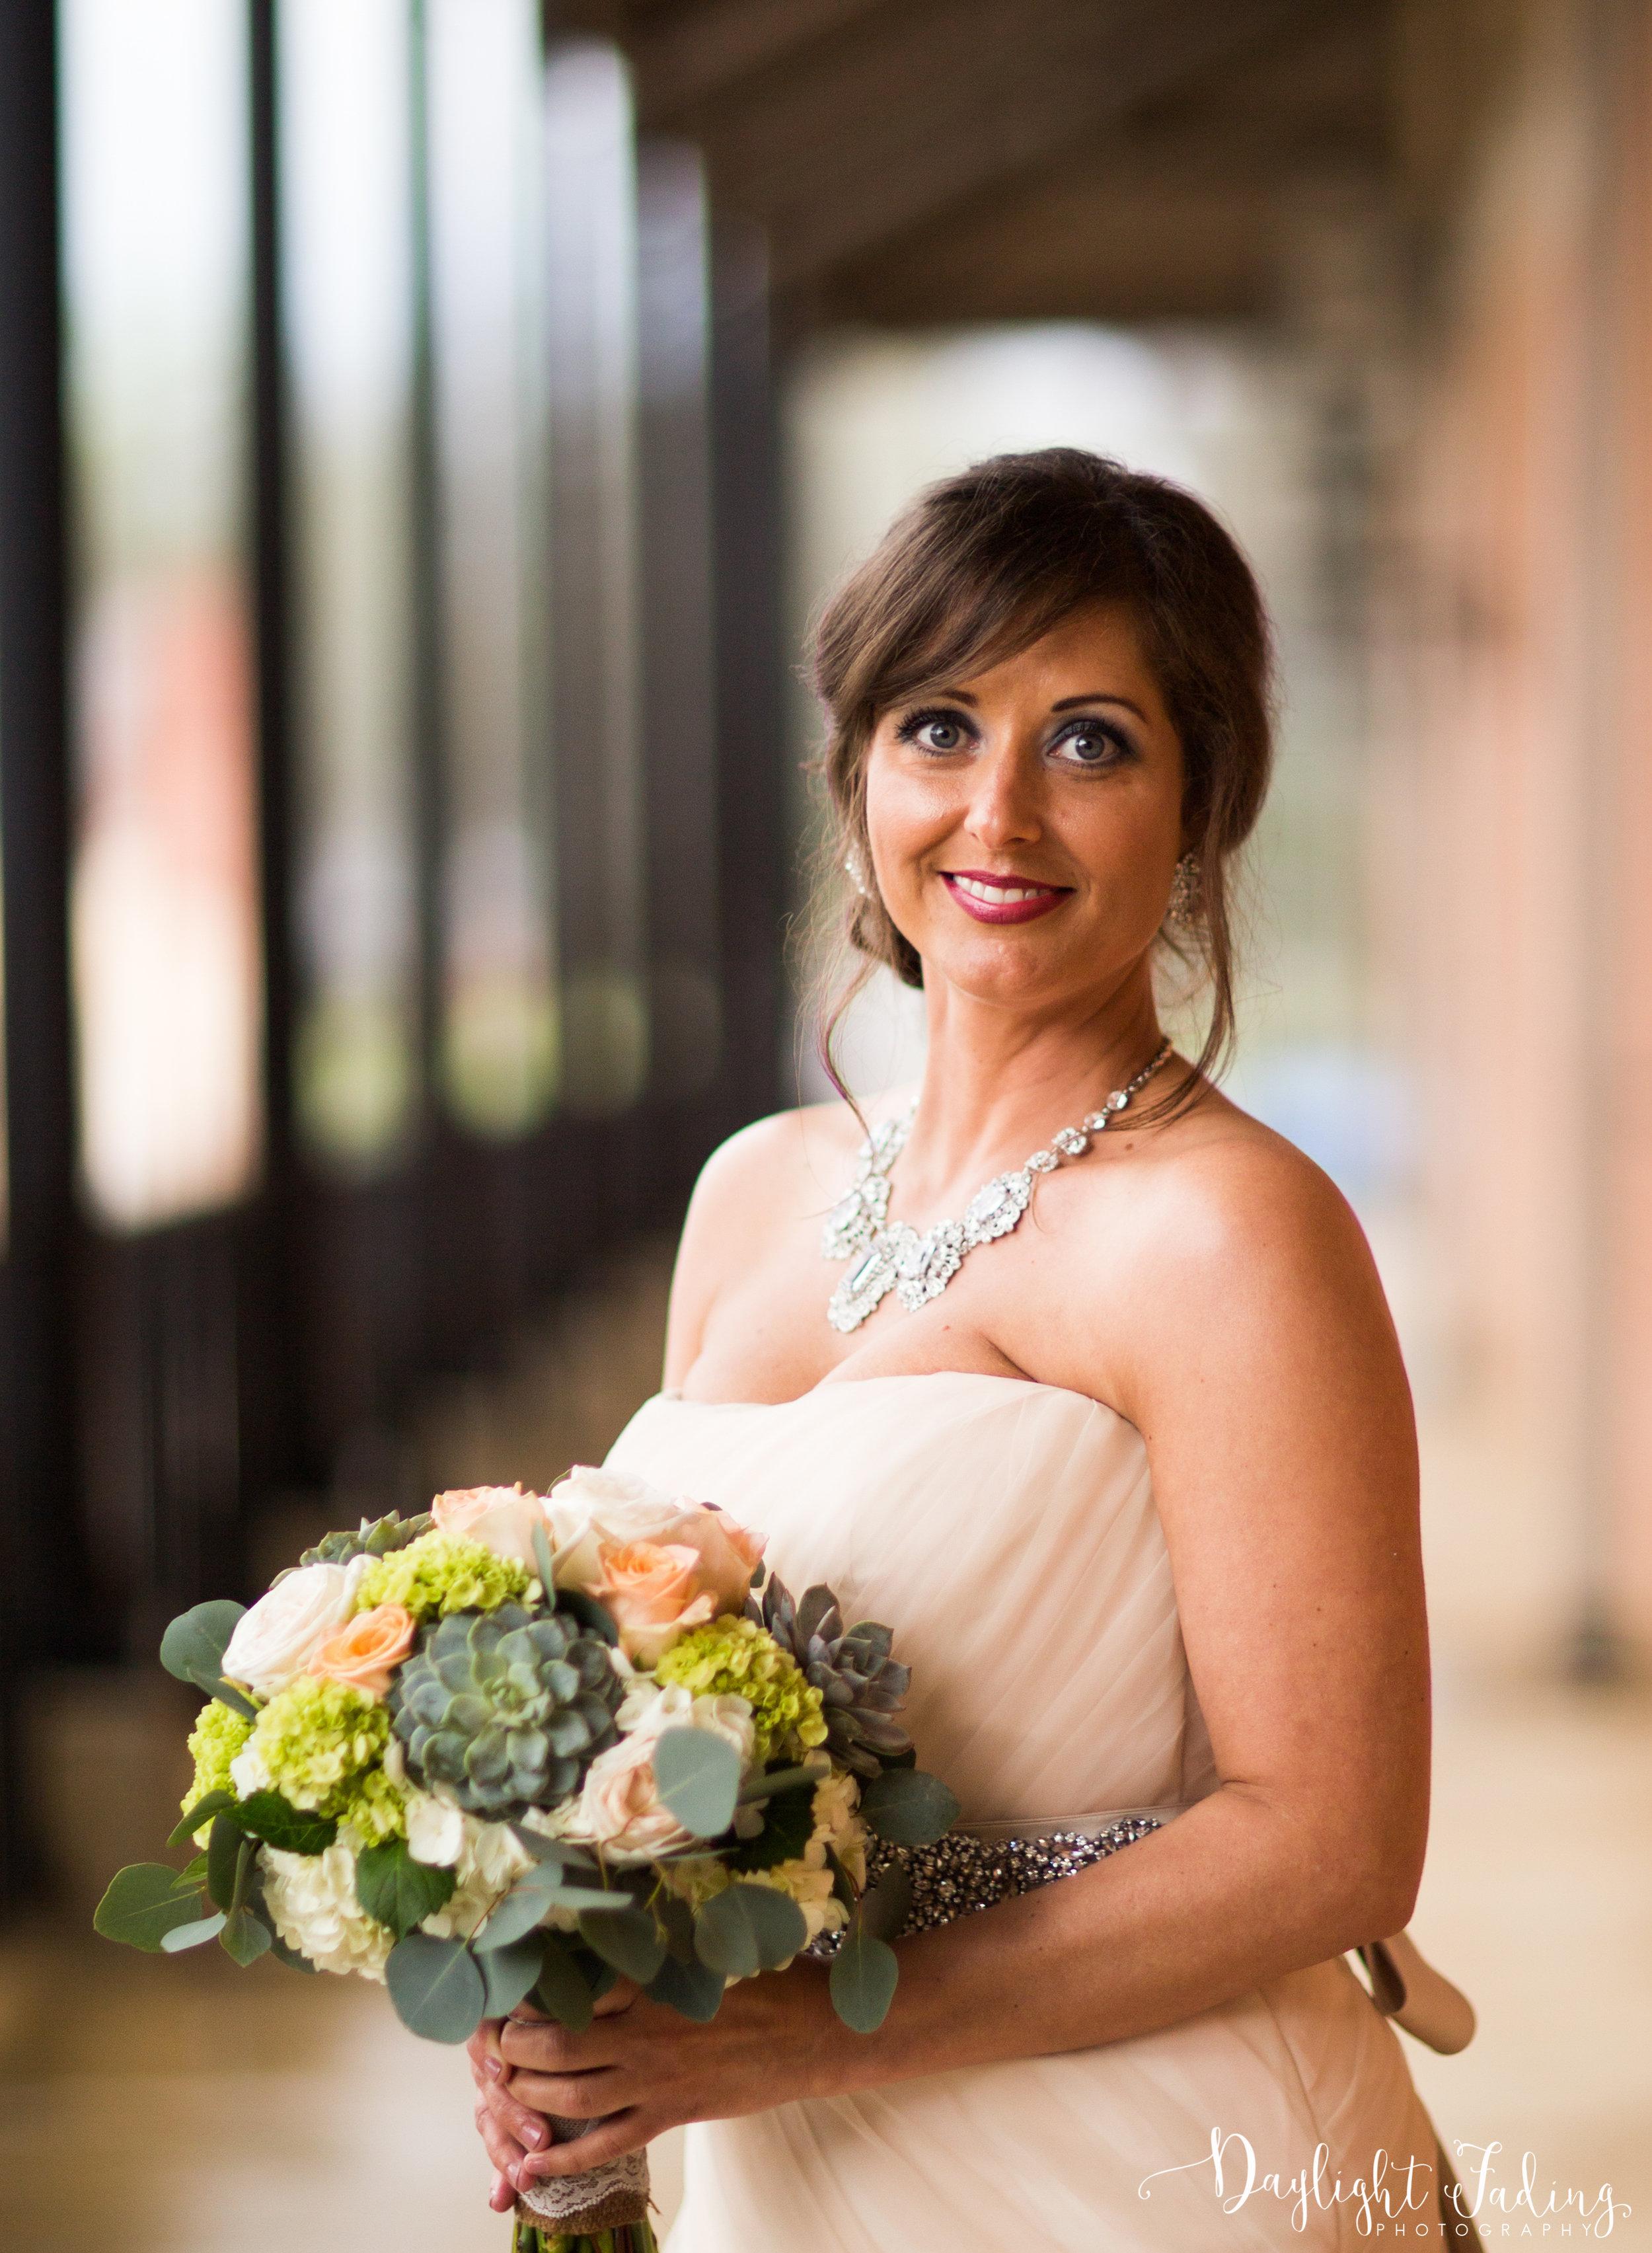 Natchitoches Event Center Wedding Photographer - daylightfadingphotography.com